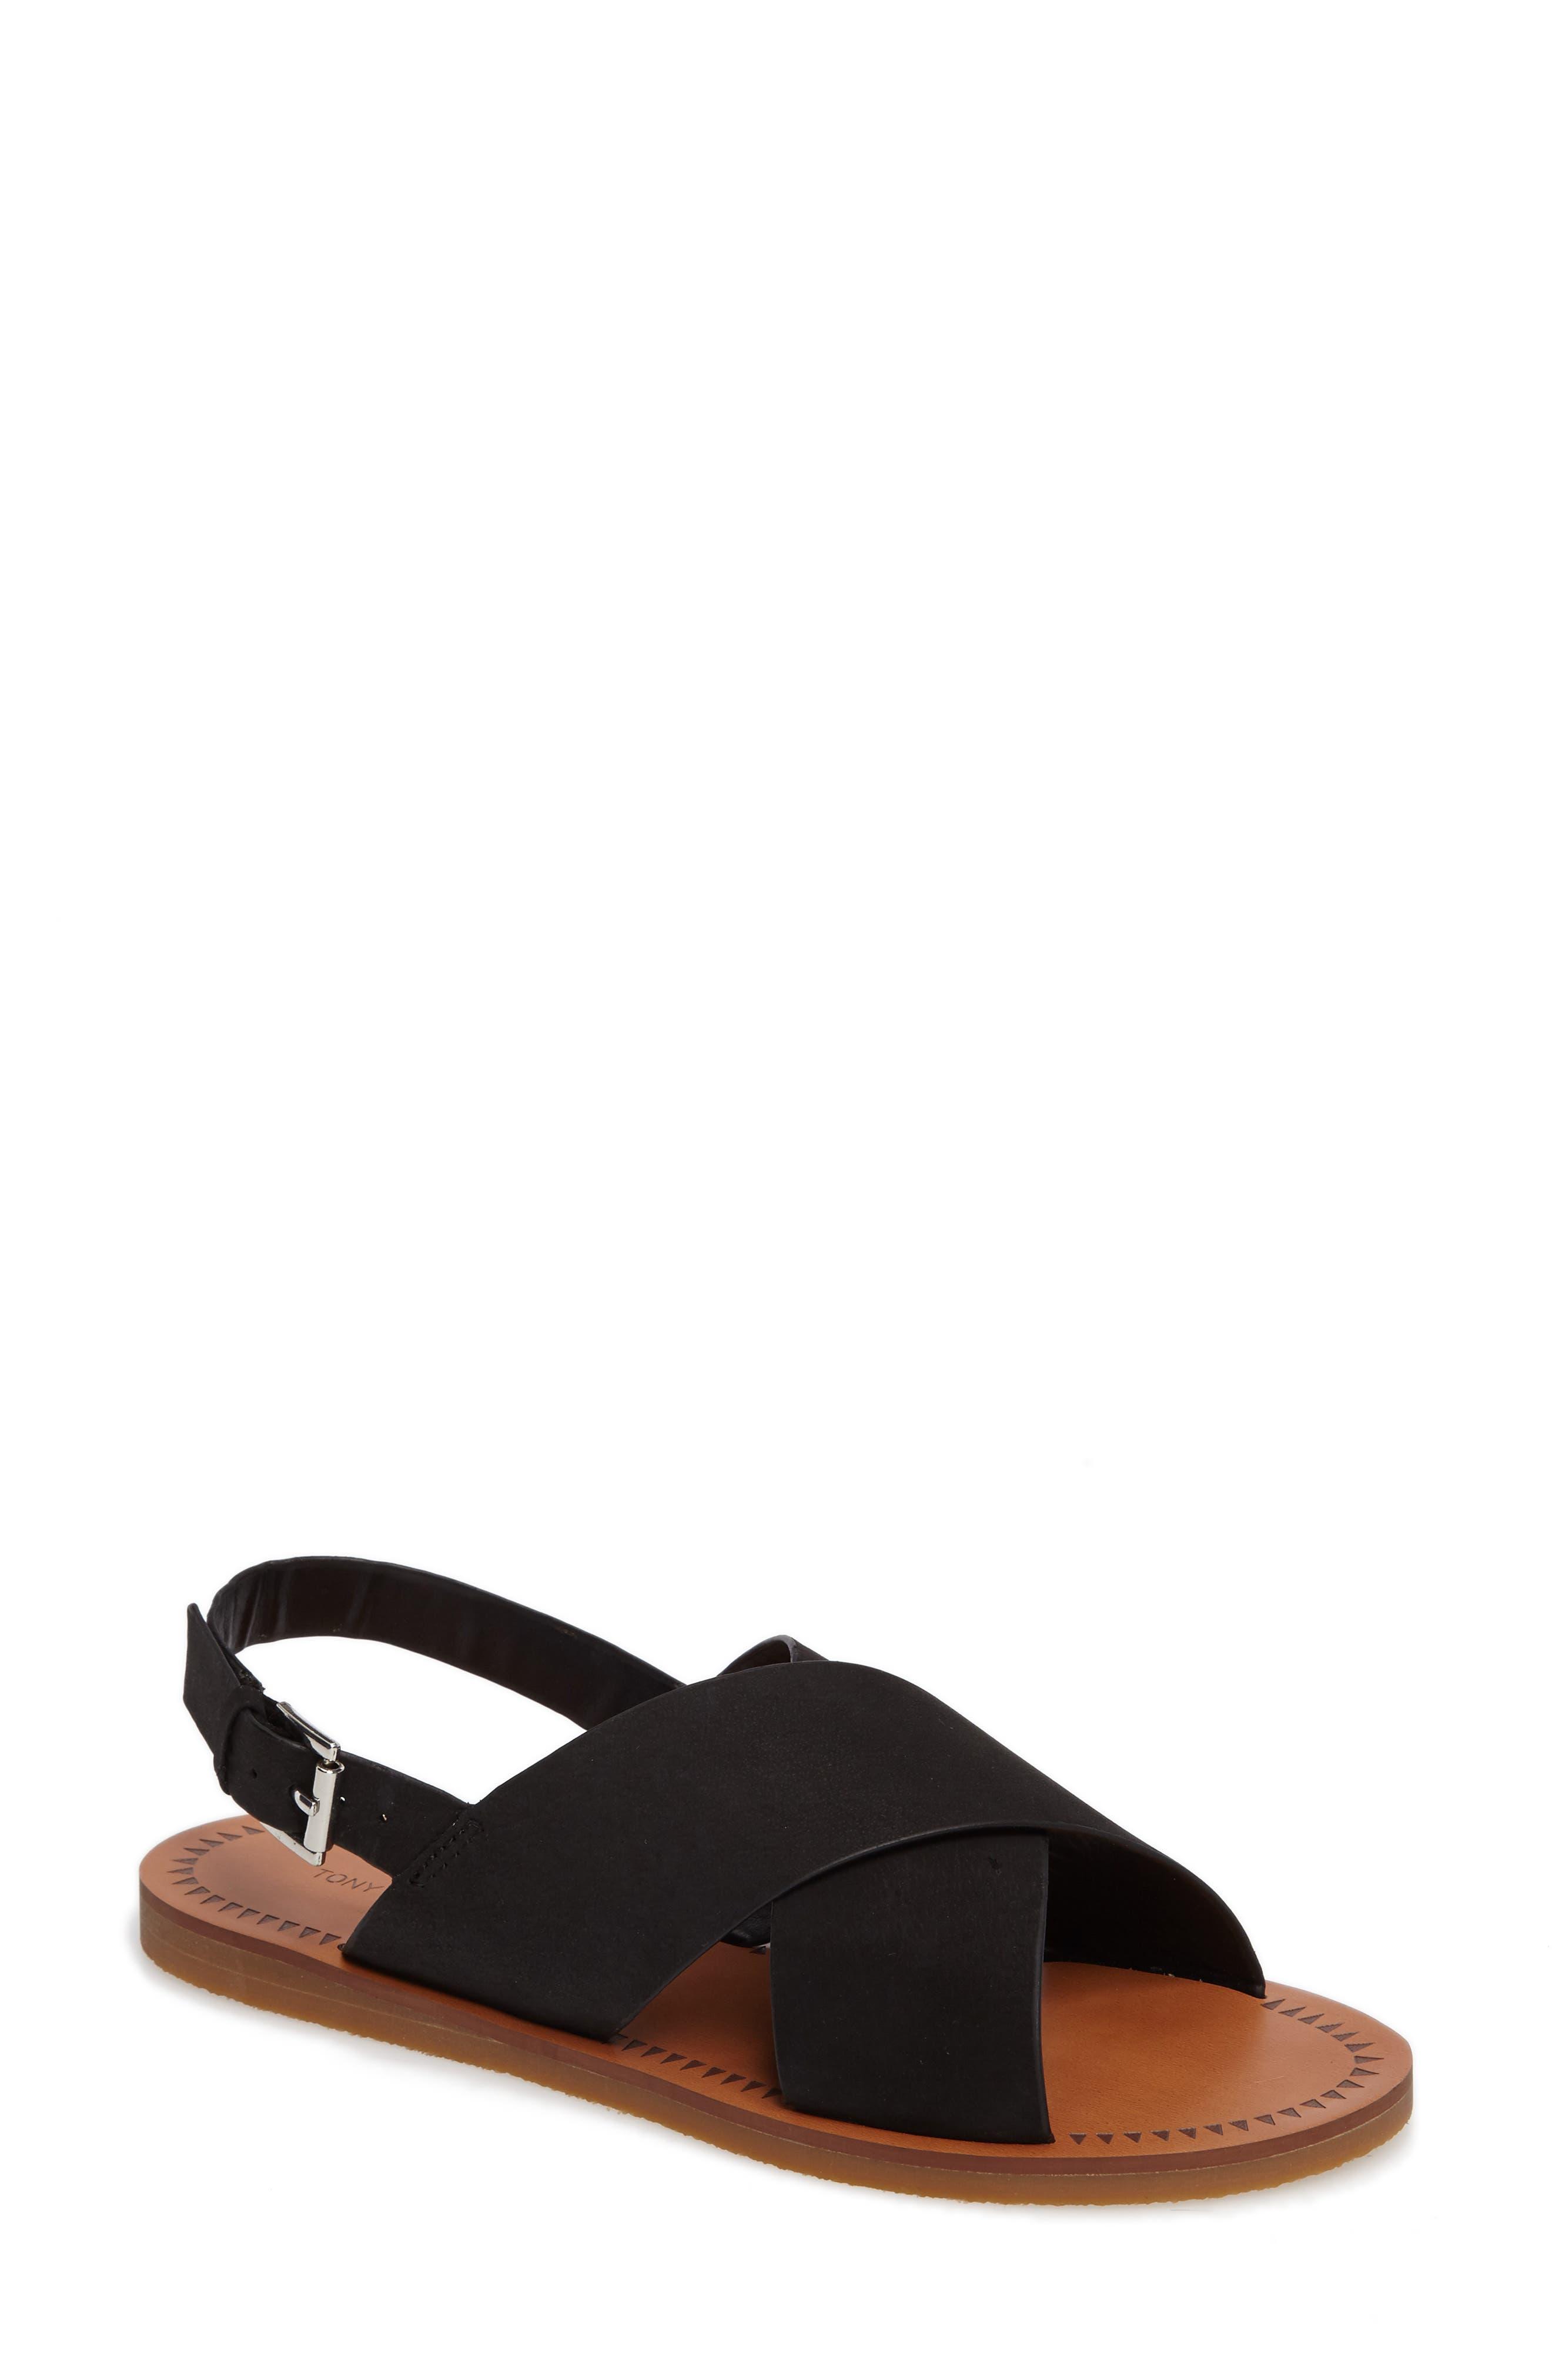 Henri Cross Strap Sandal,                         Main,                         color, Black Phoenix